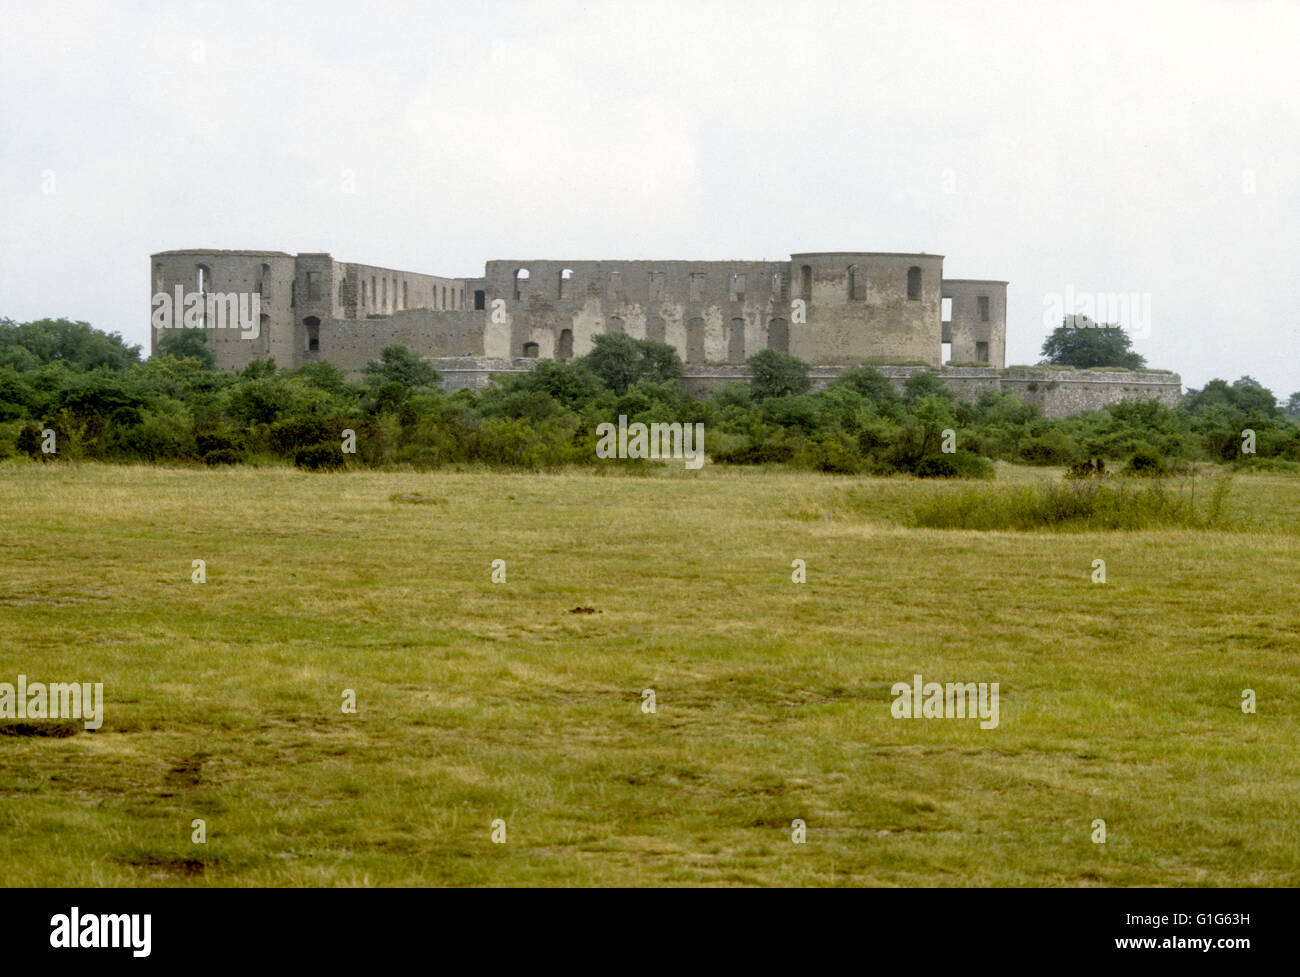 Borgholm Ruined castle on Alvaret - Stock Image